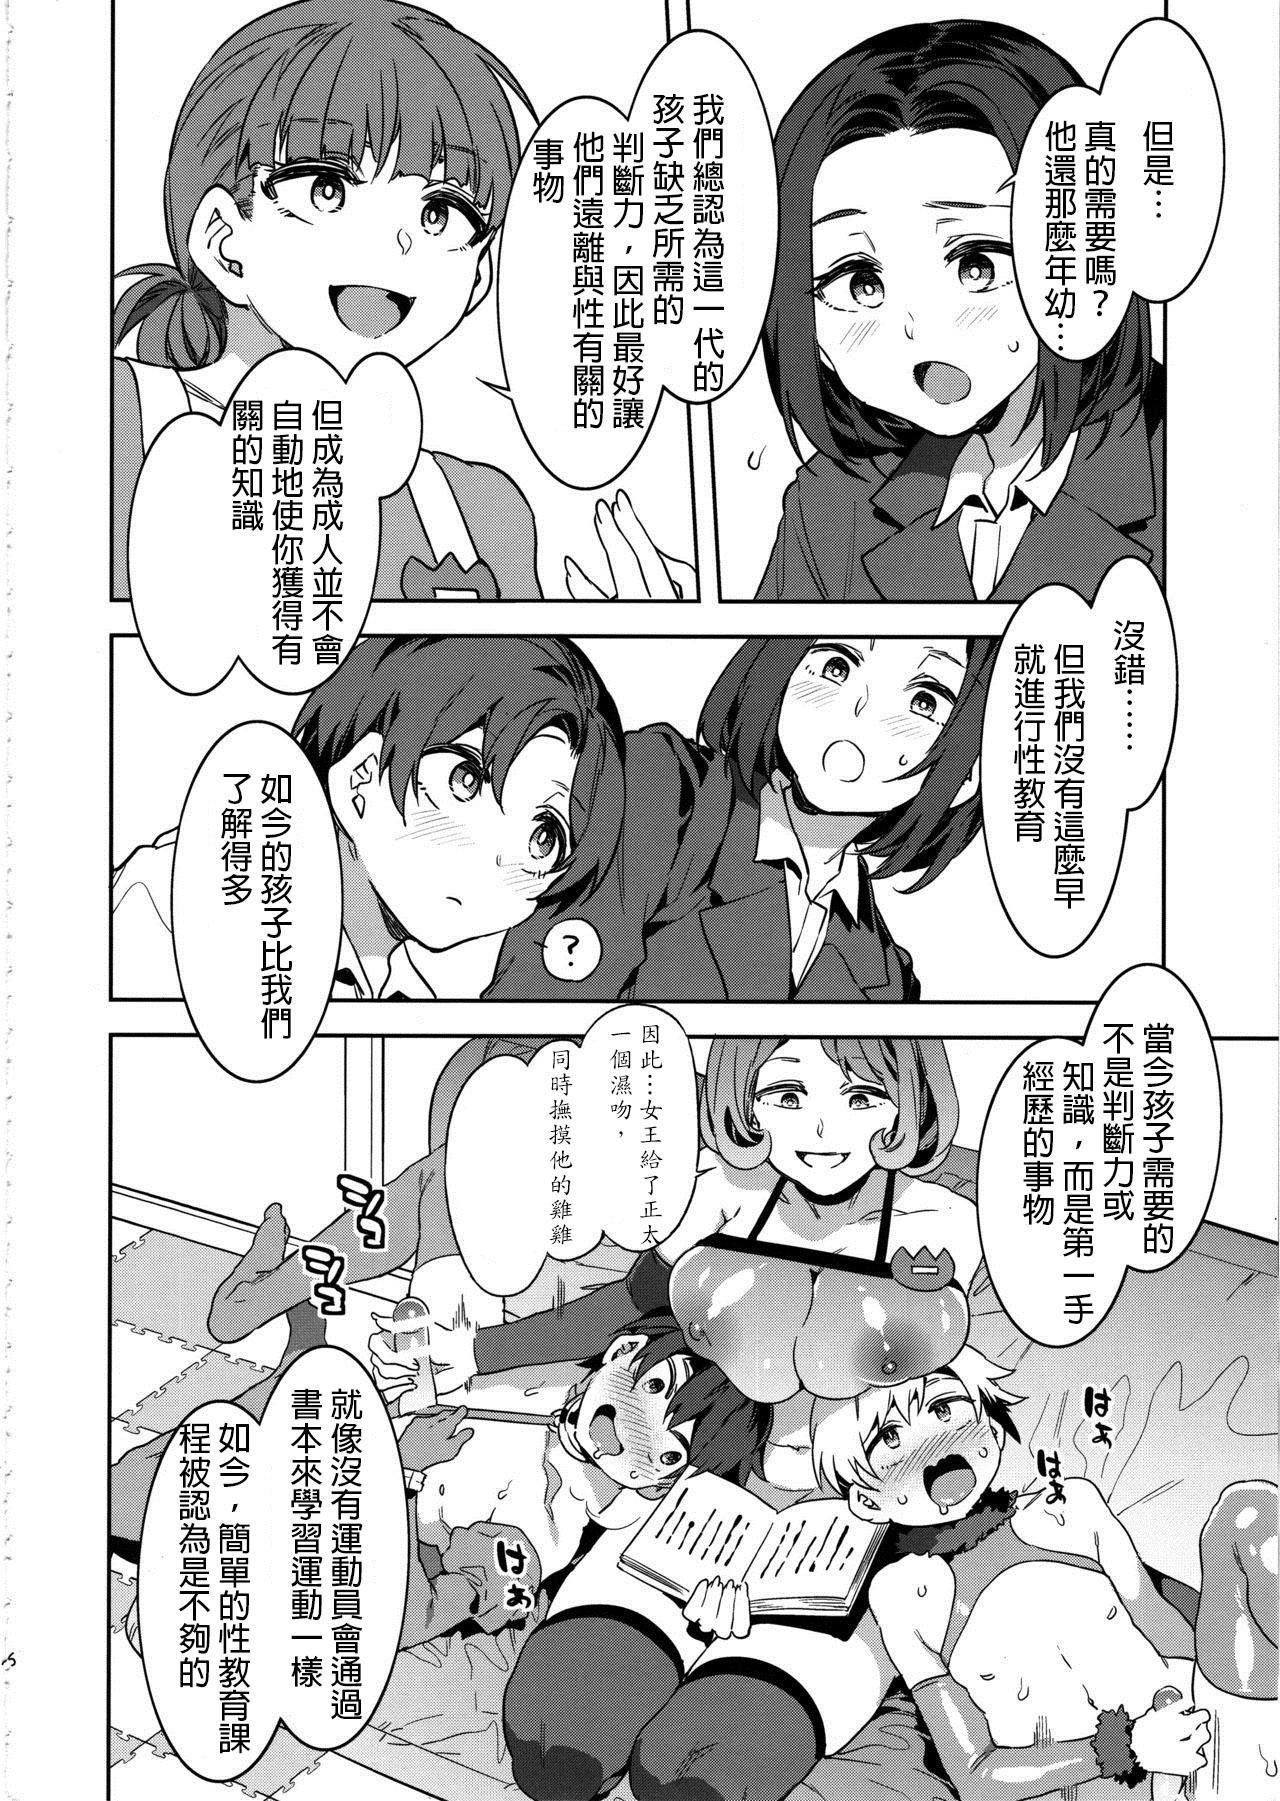 Oideyo! Mizuryu Kei Land the 8th day 14